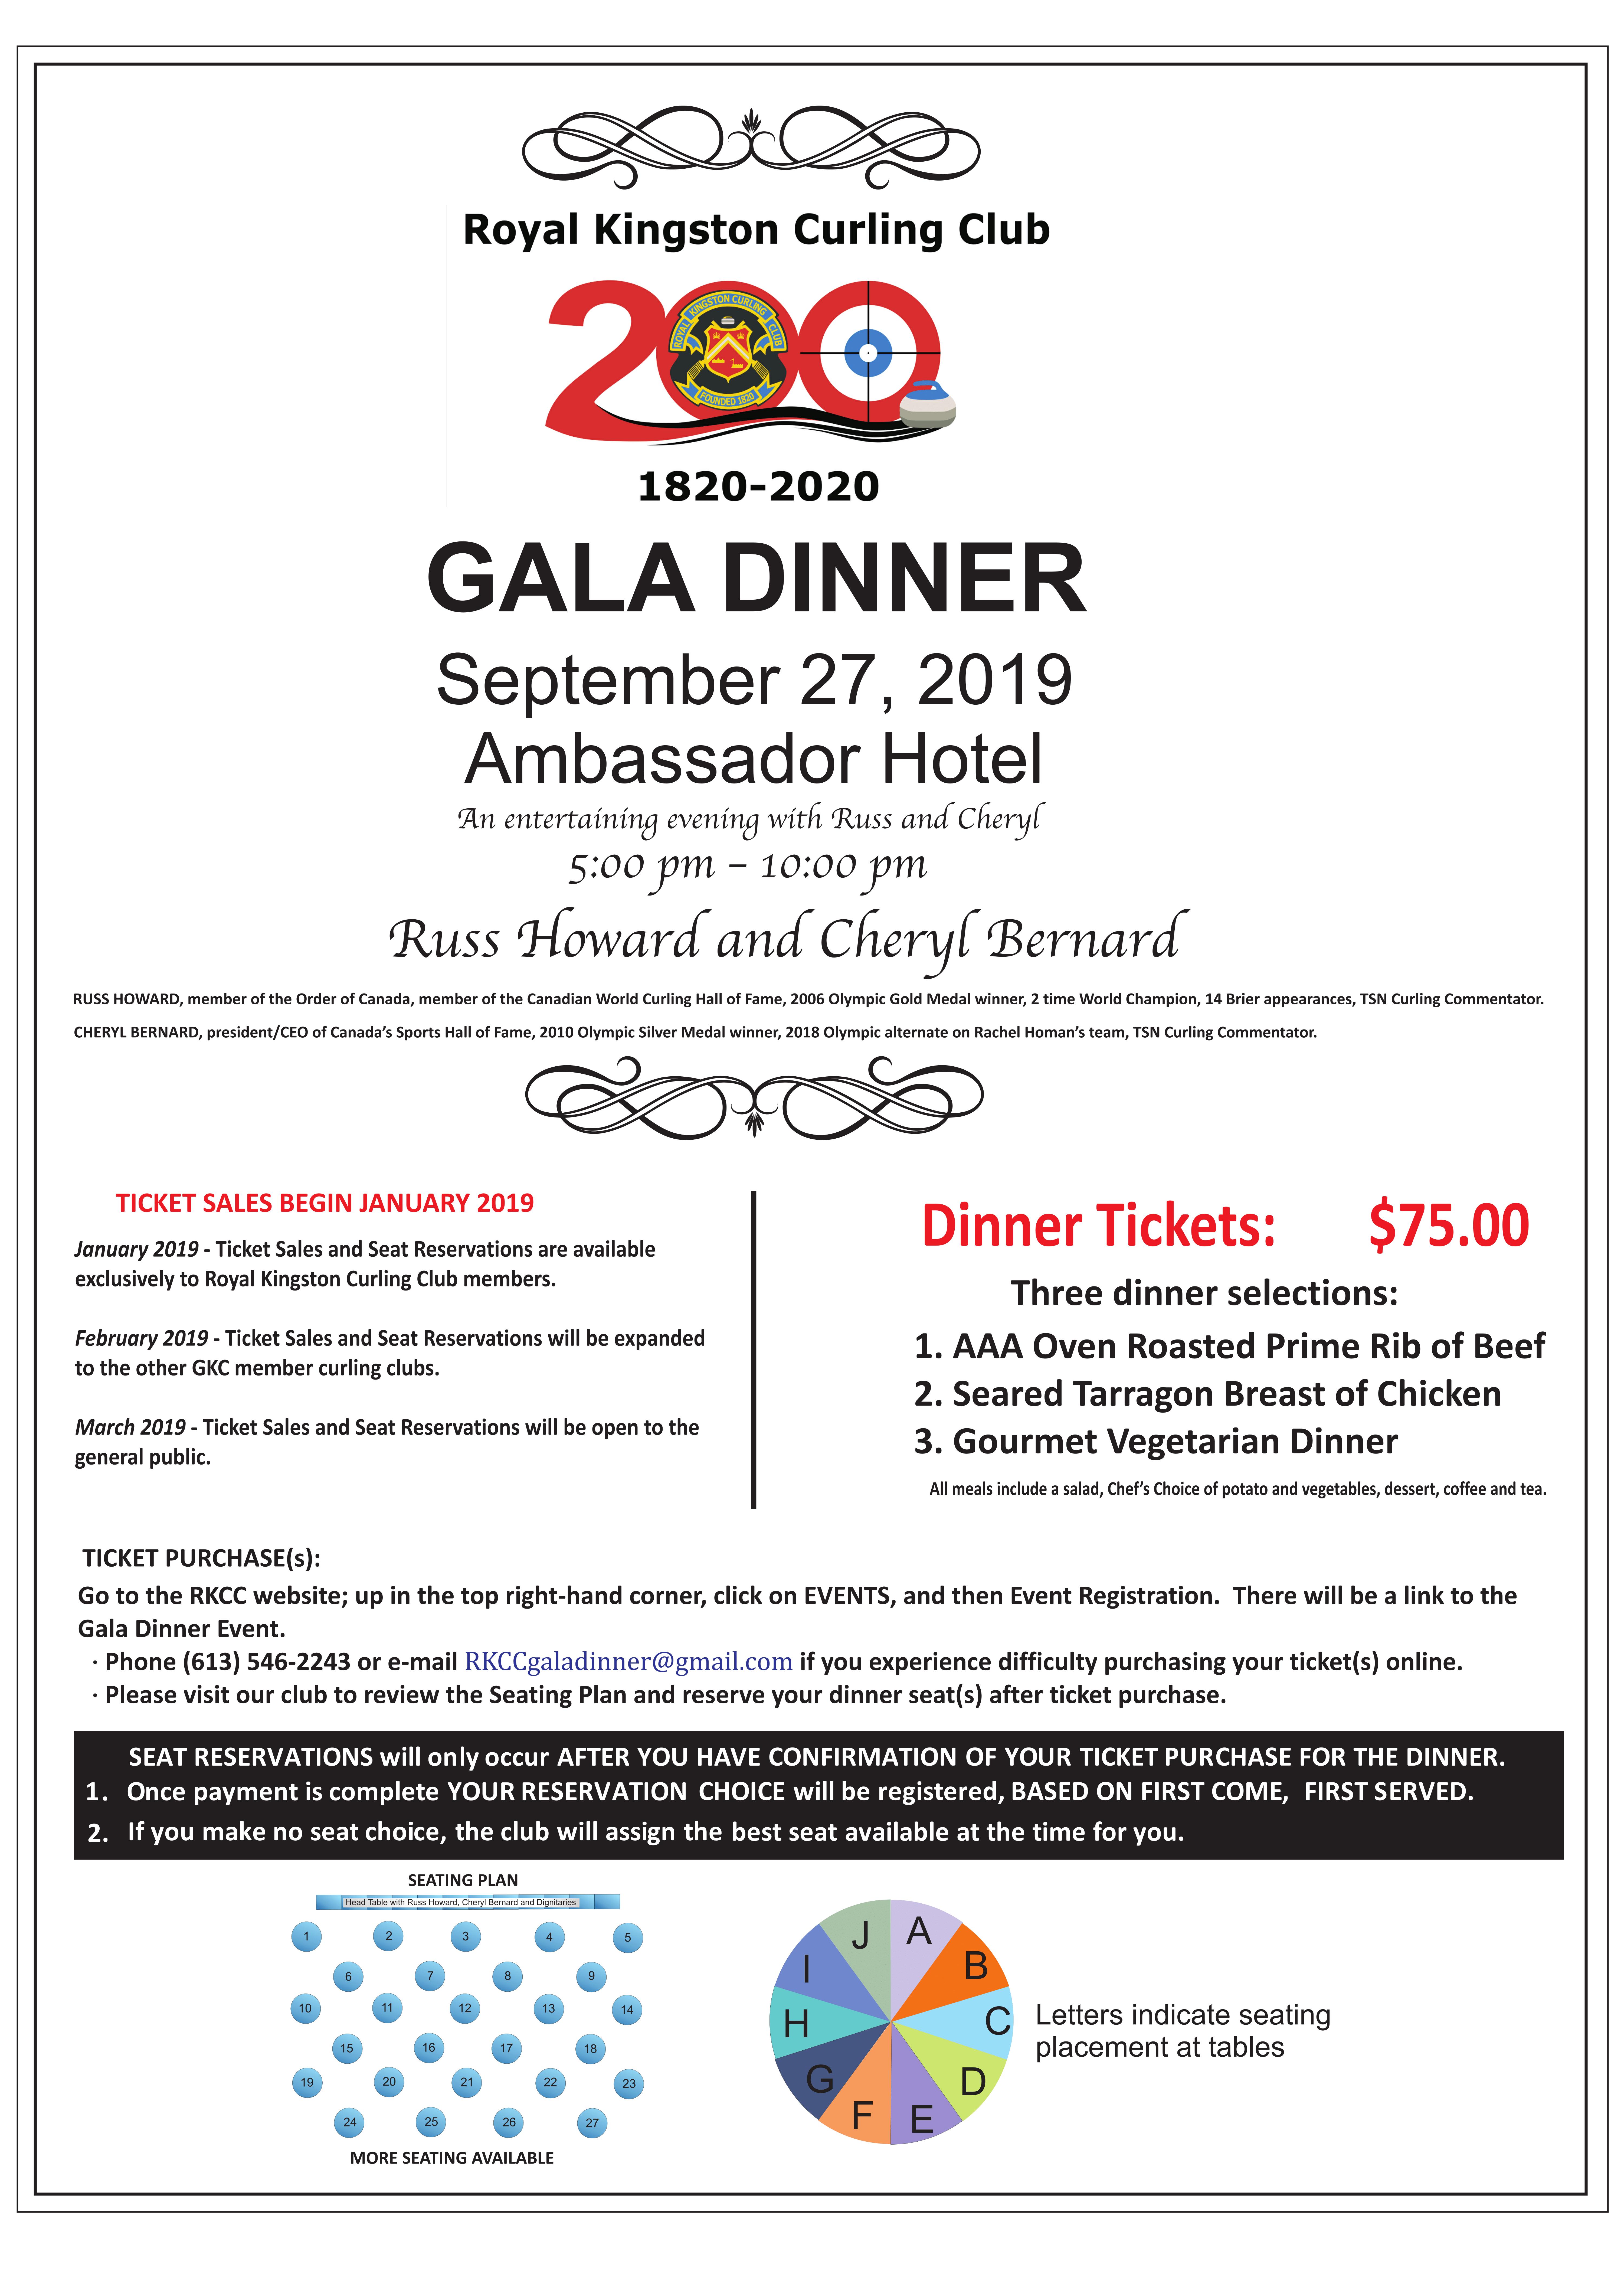 200th Anniversary Gala Dinner